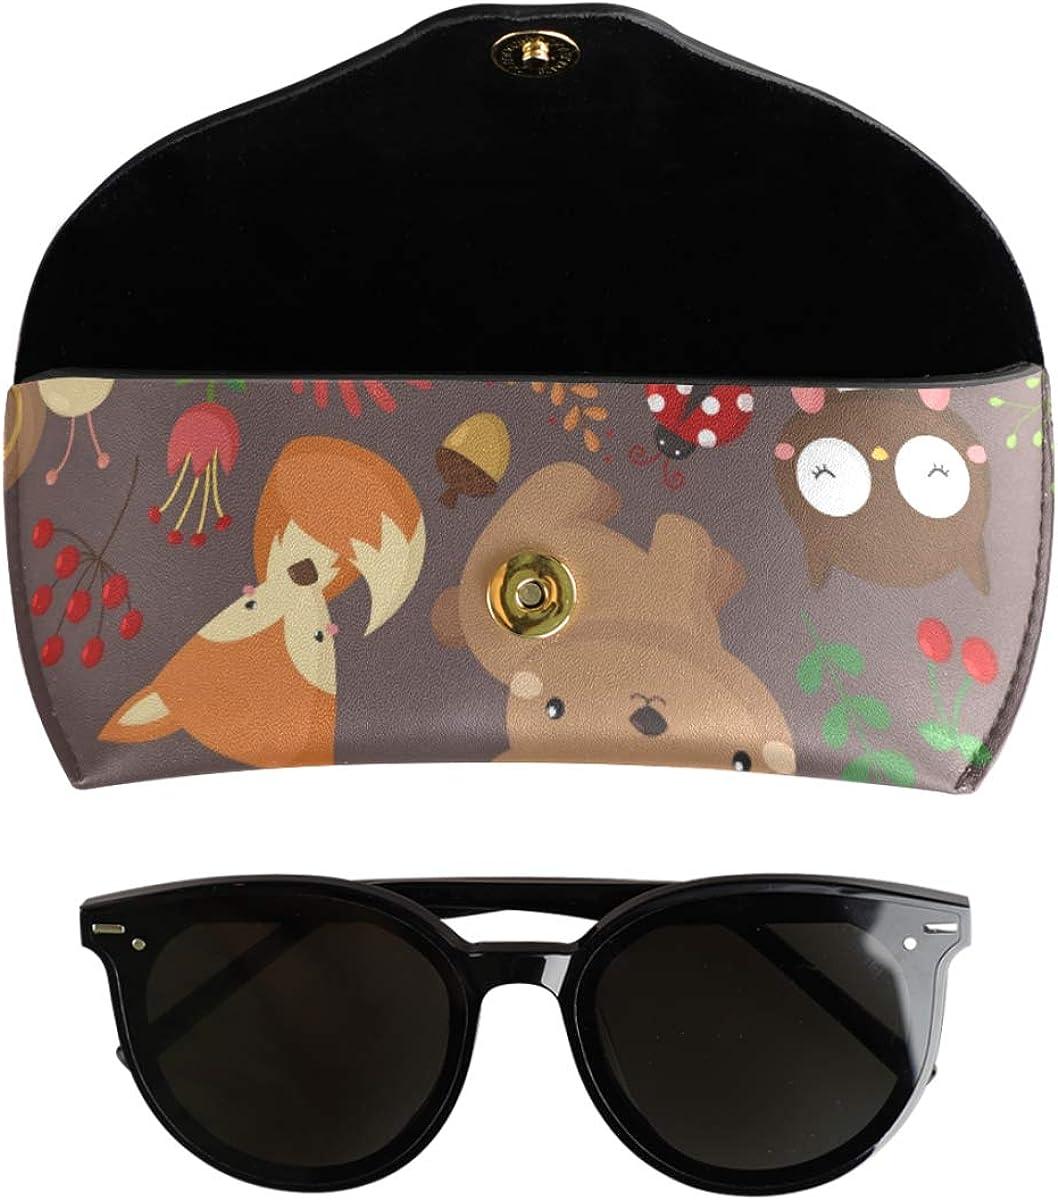 Multiuse Portable Cute Cartoon Animal Woodland Goggles Bag PU Leather Sunglasses Case Eyeglasses Pouch present